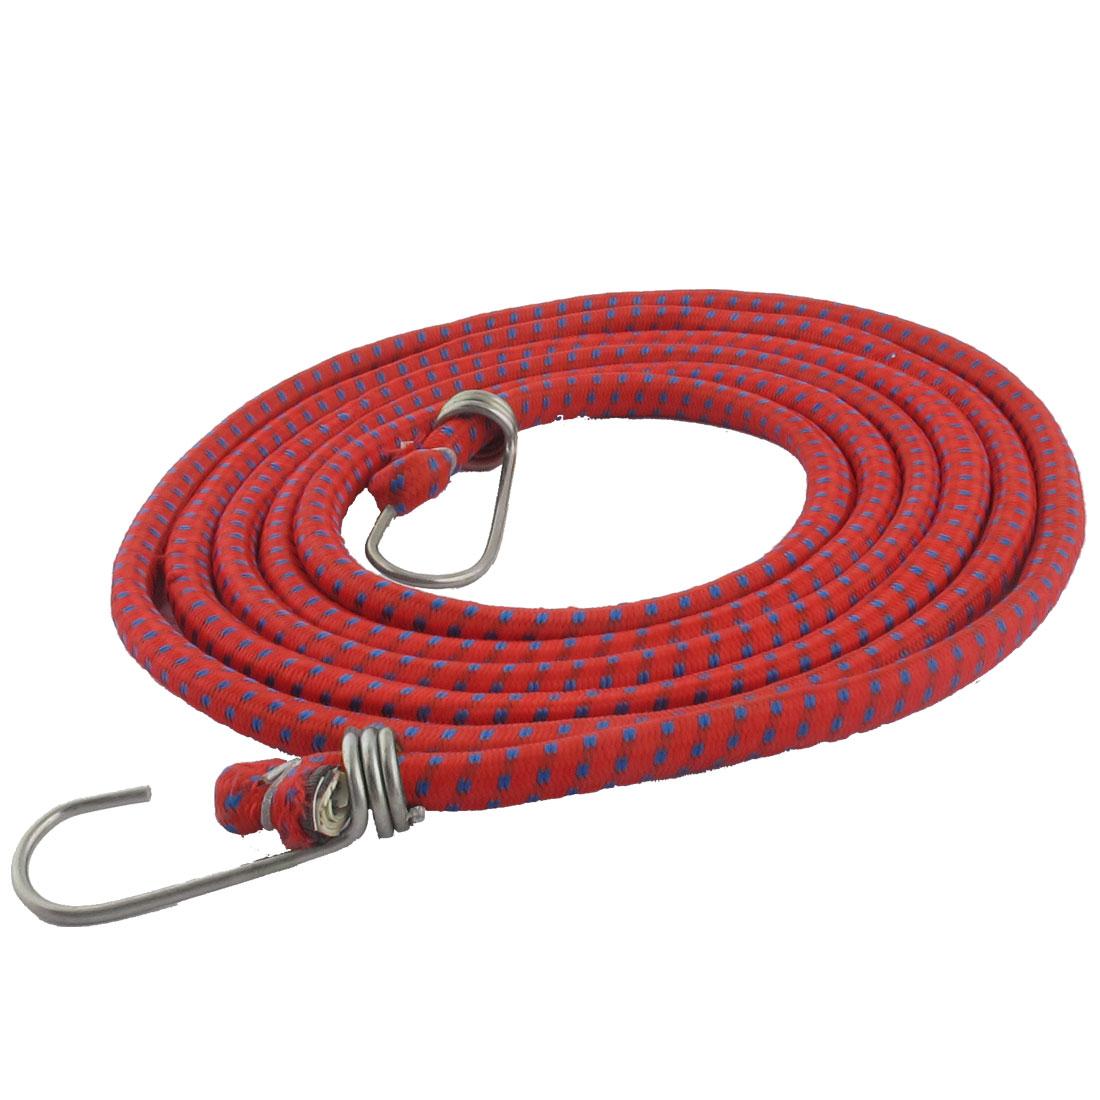 Bike Bicycle Luggage Metal Hook Clasp Blue Red Stretchy Braid Rope Cord 2.8M